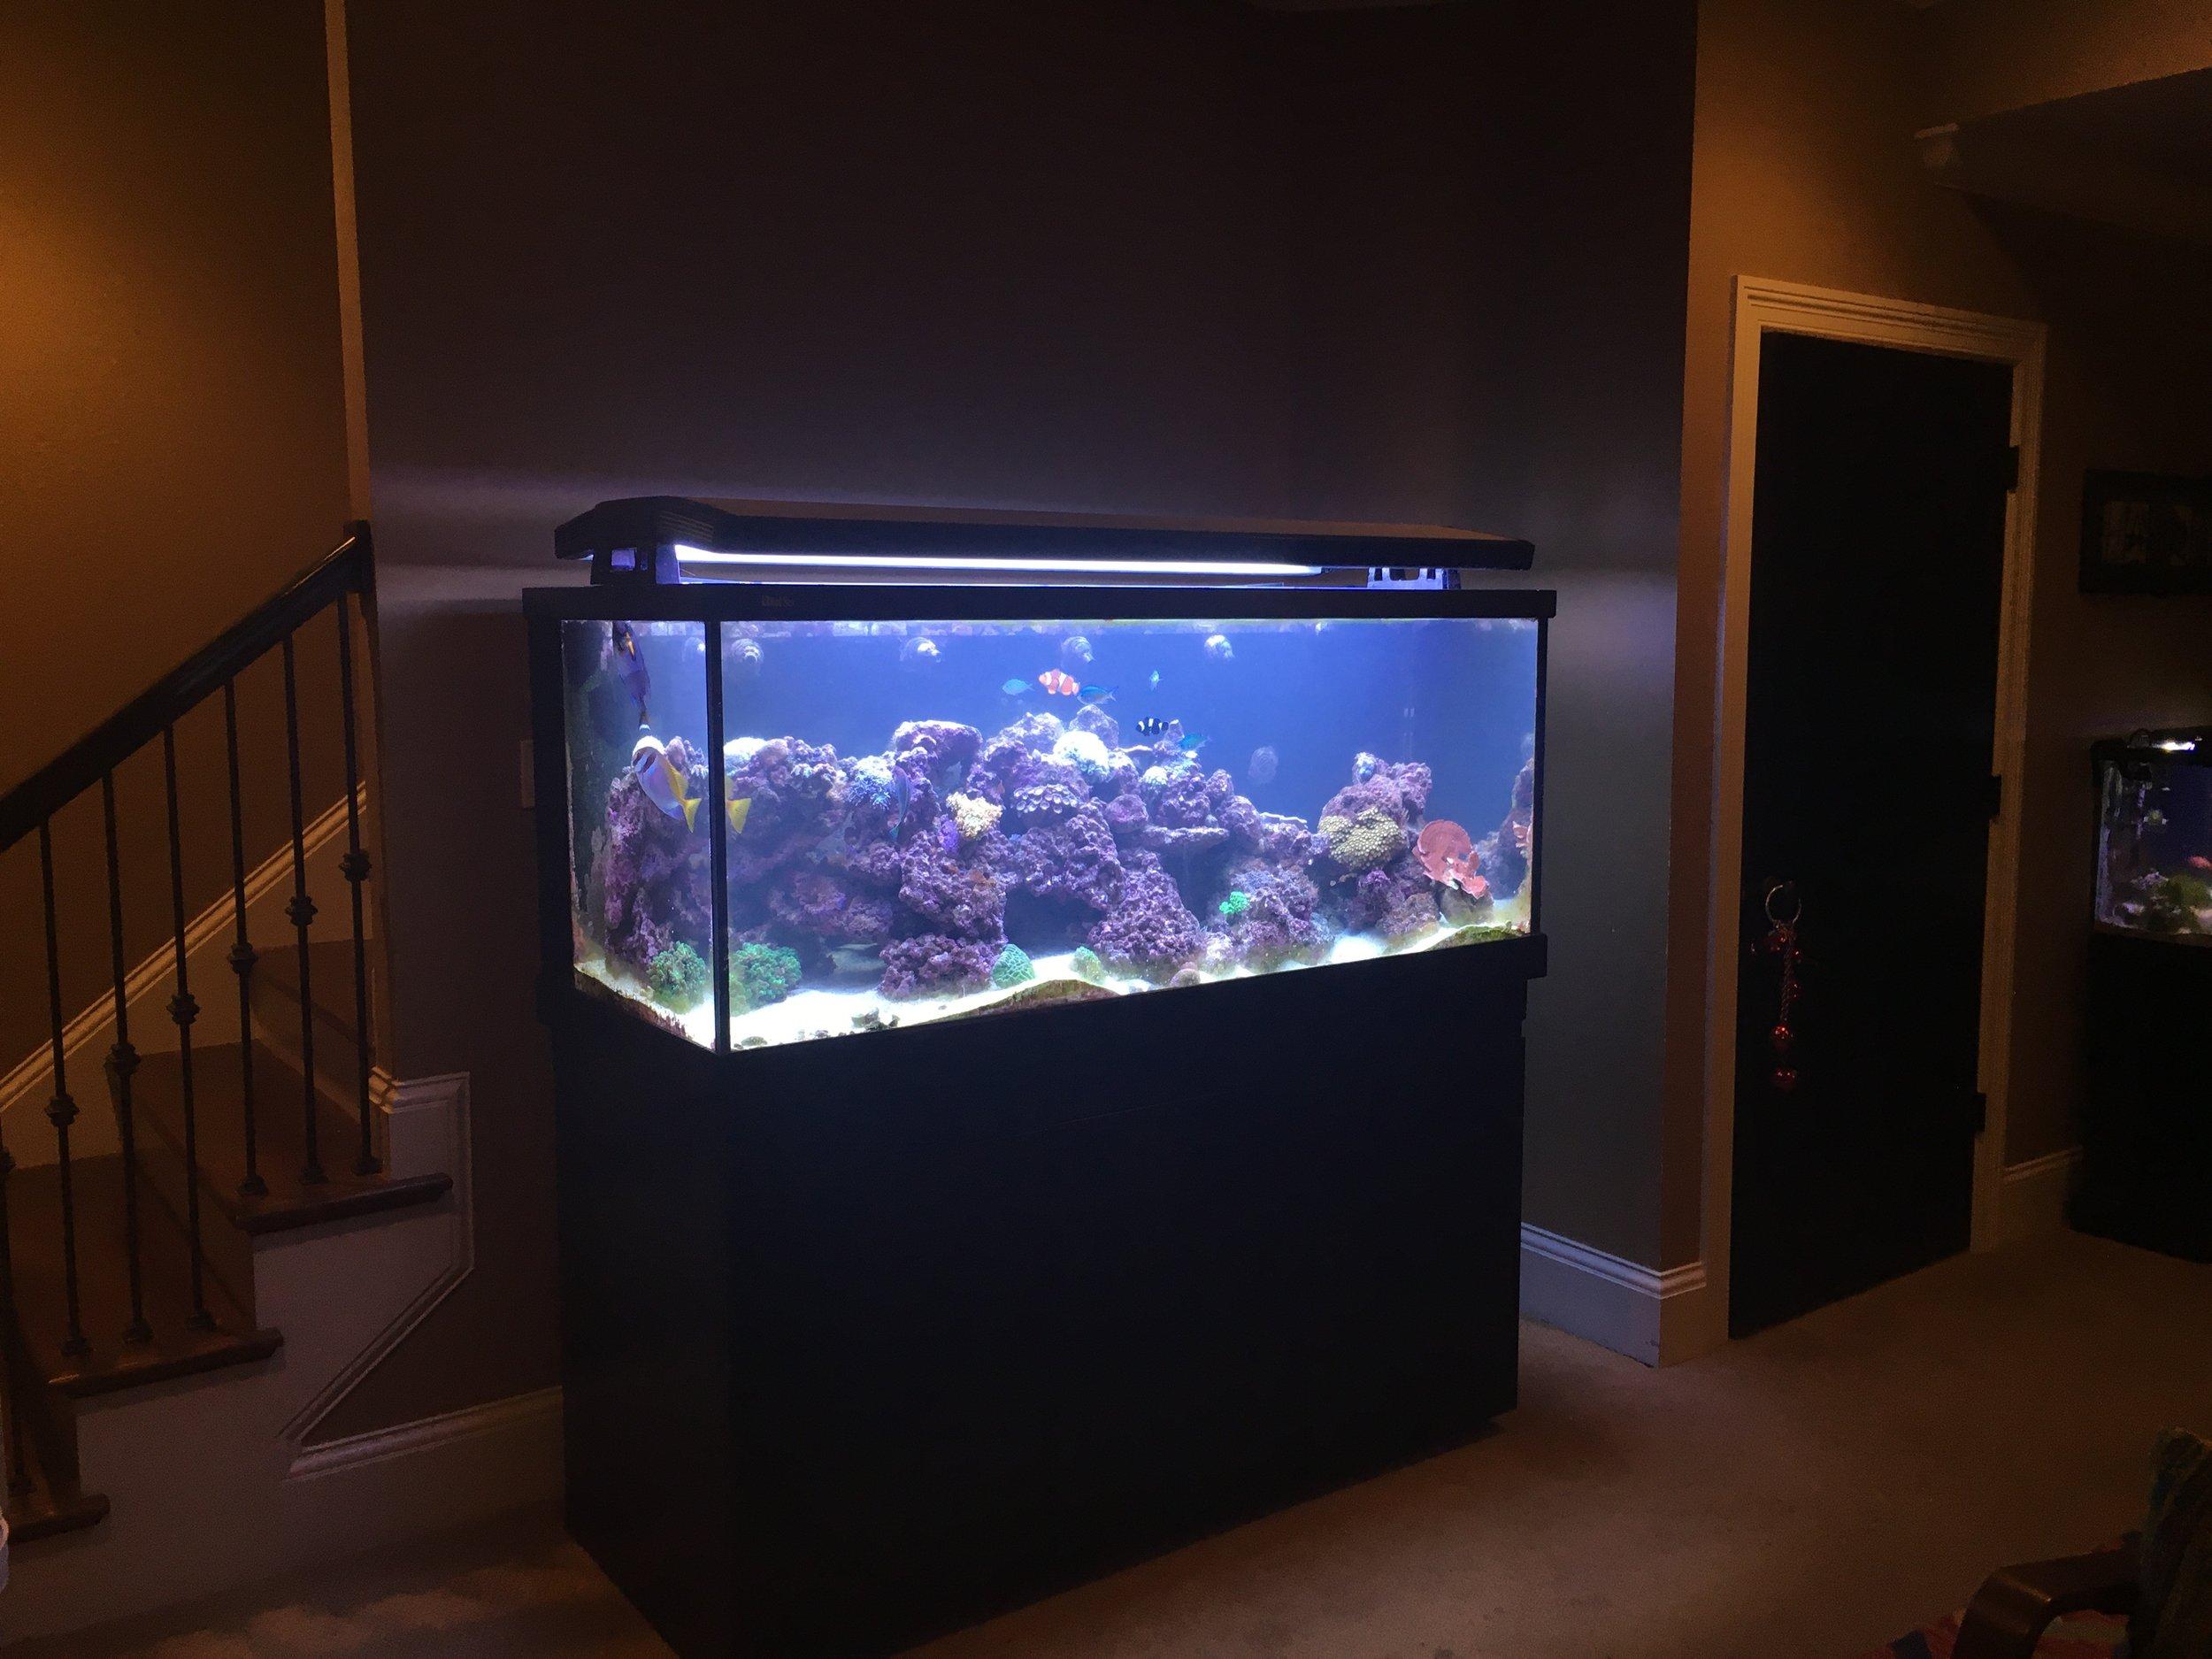 Saltwater Reef Aquarium in Customer's Home